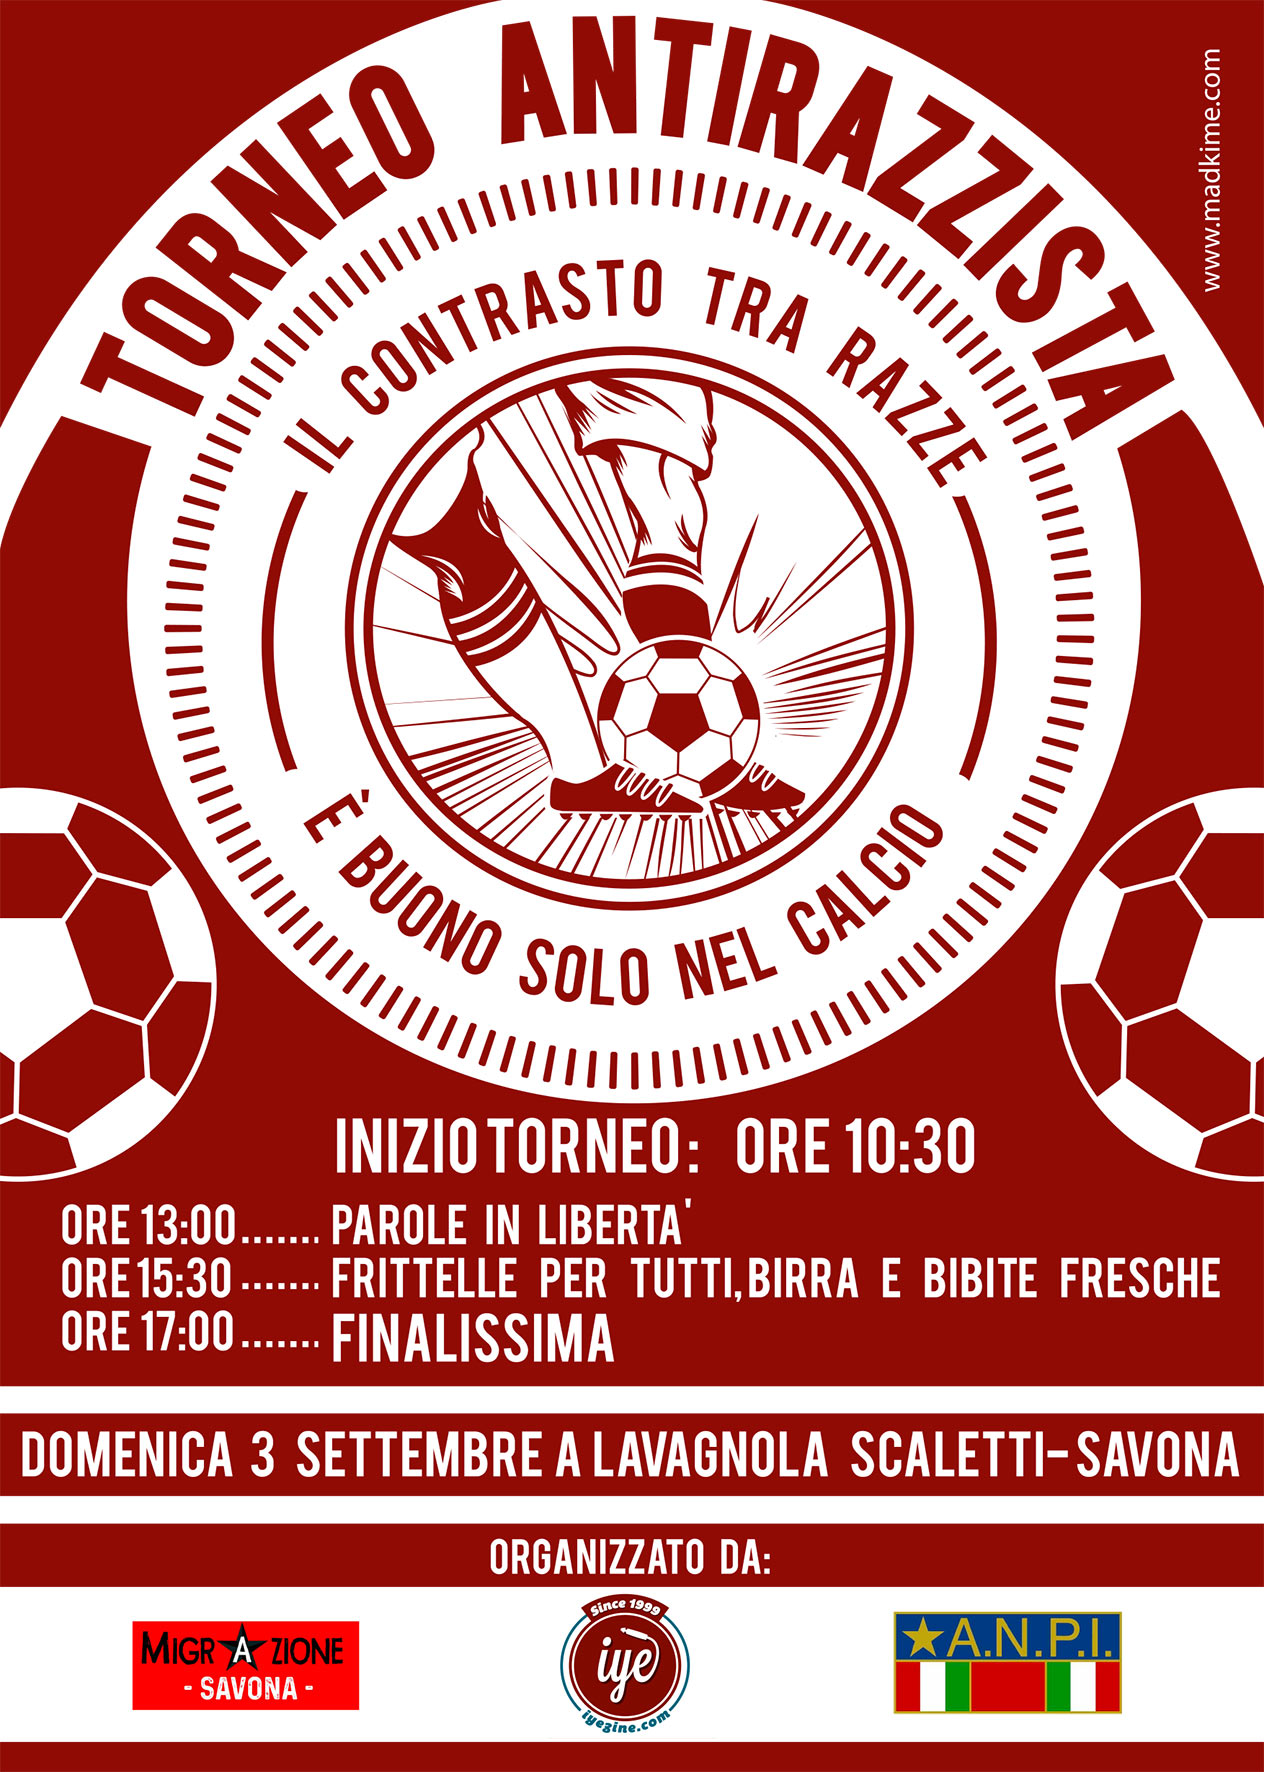 Torneo antirazzista a Savona 2017 1 - fanzine